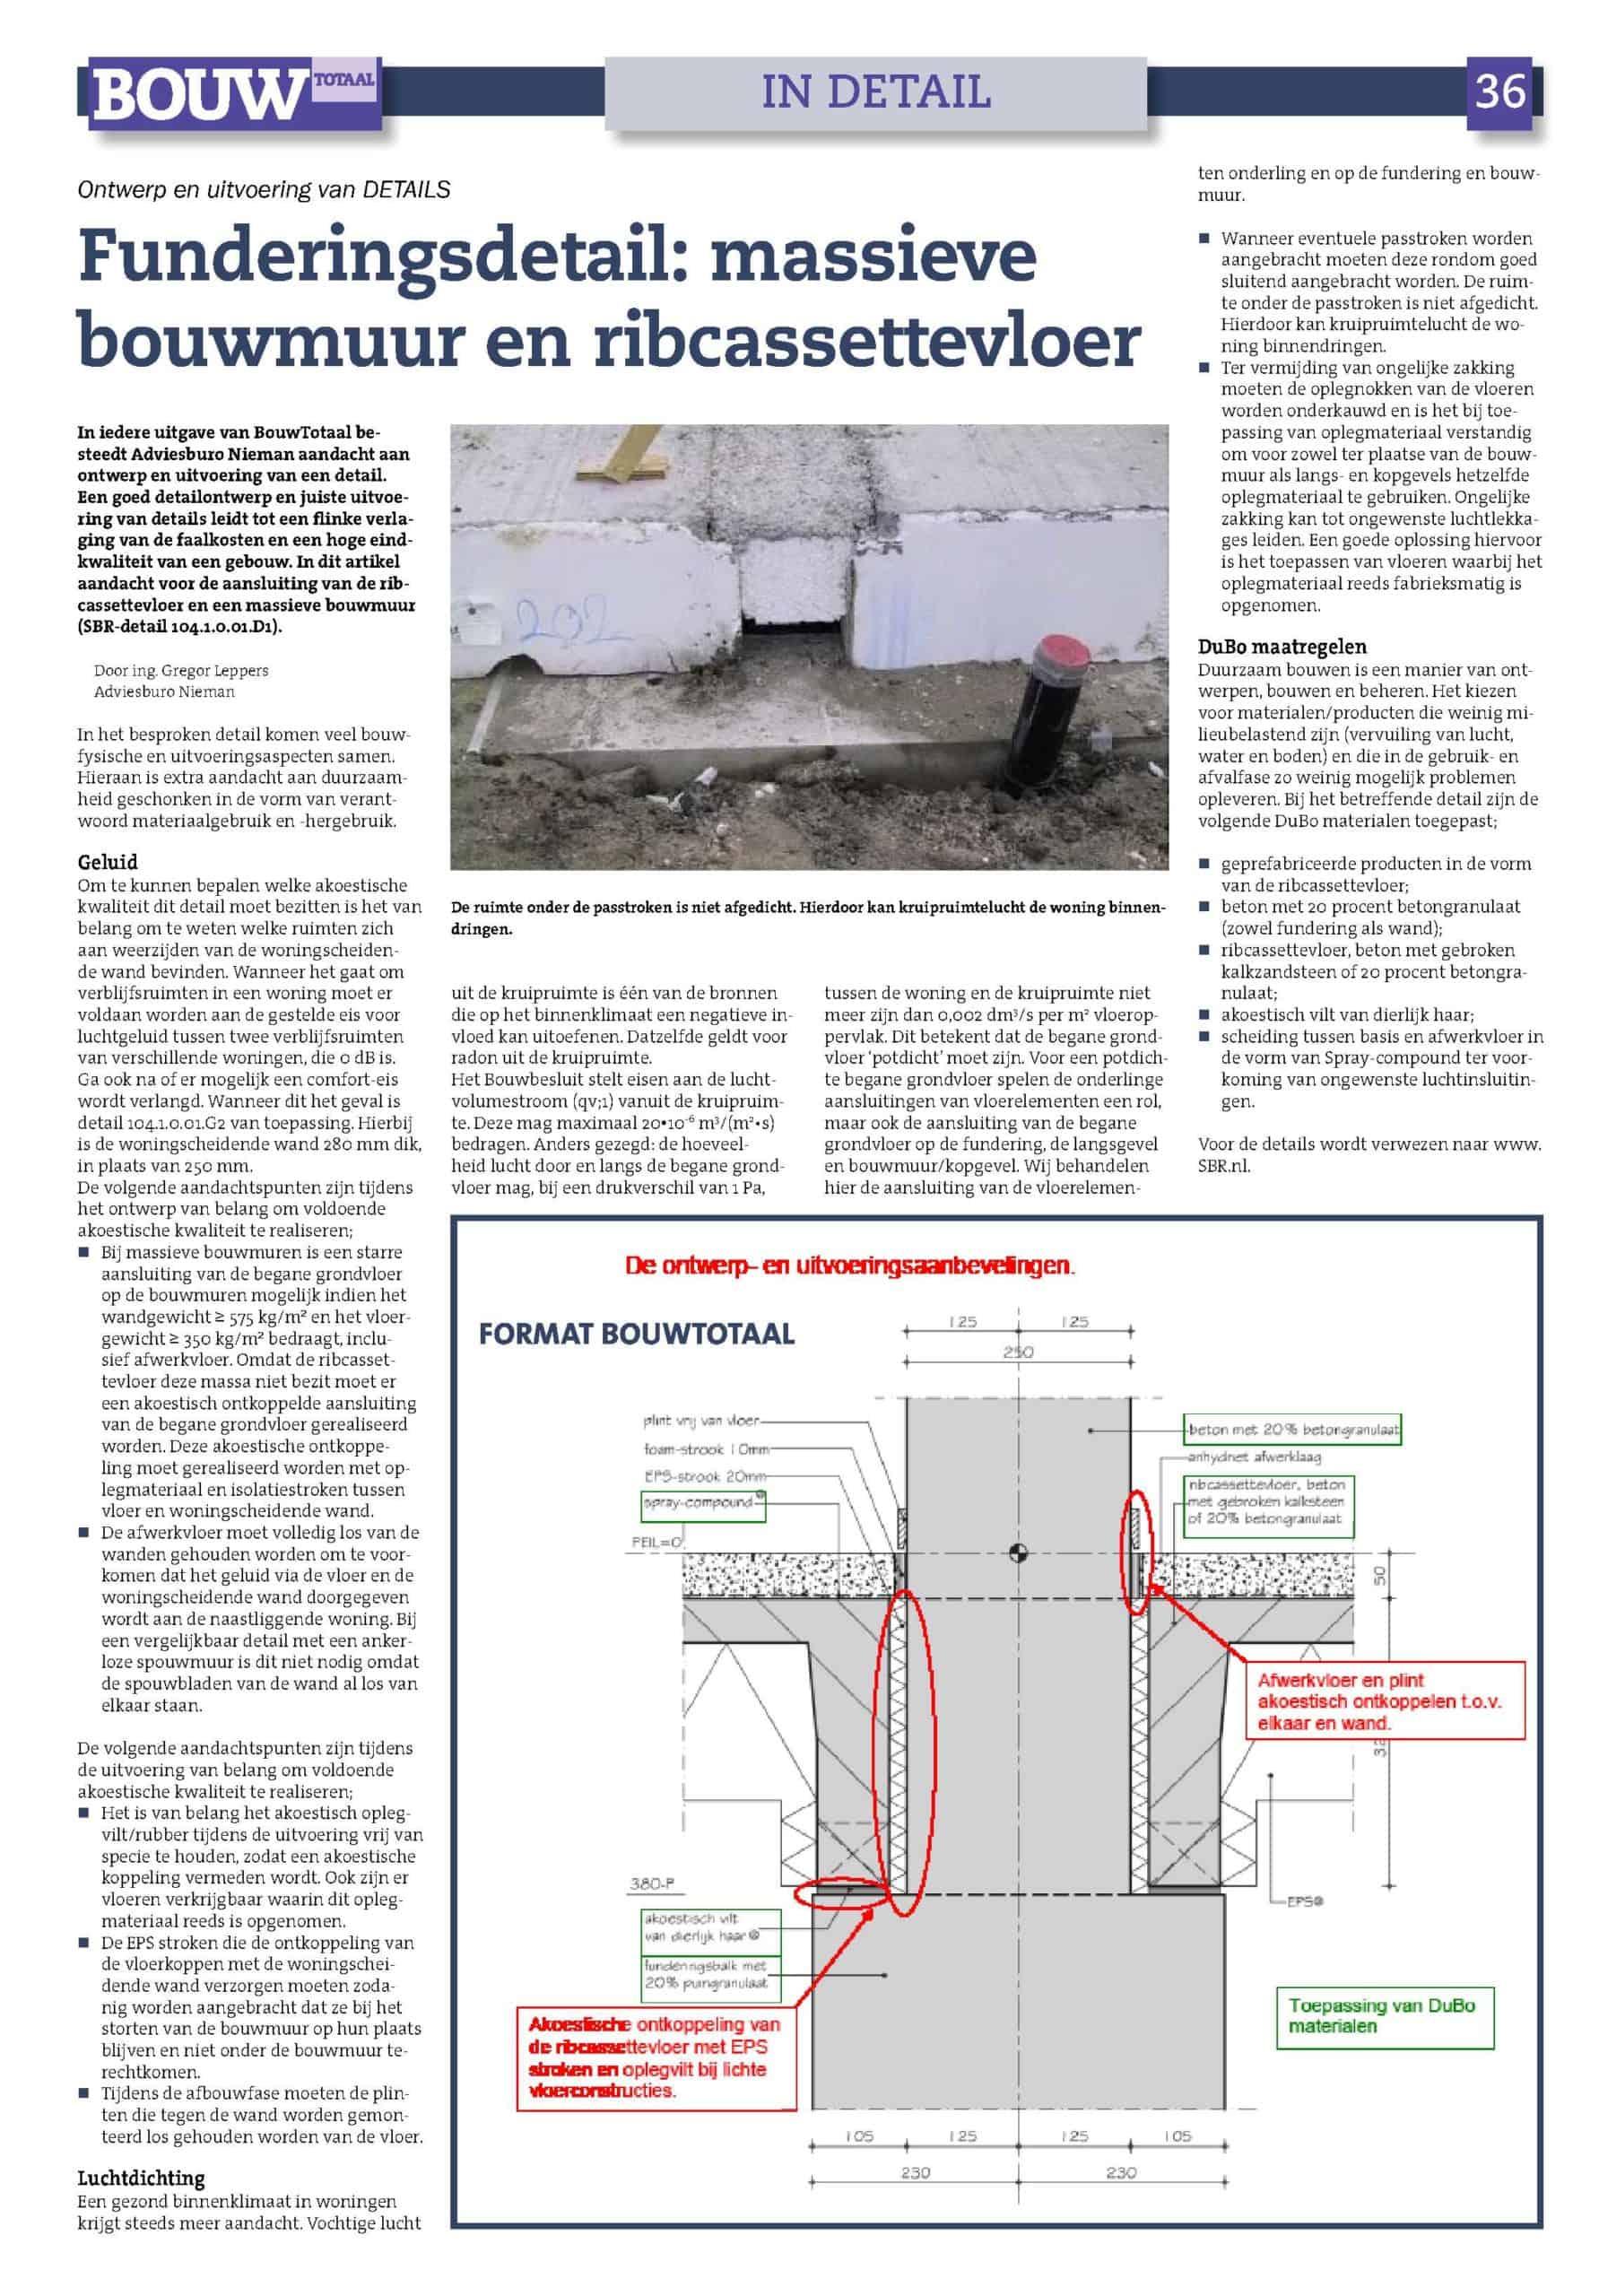 Bouwtotaal_BT.09.10.Detail_Funderingsdetail-massieve-bouwmuur-en-ribcassette-vloer_GLe-1-scaled